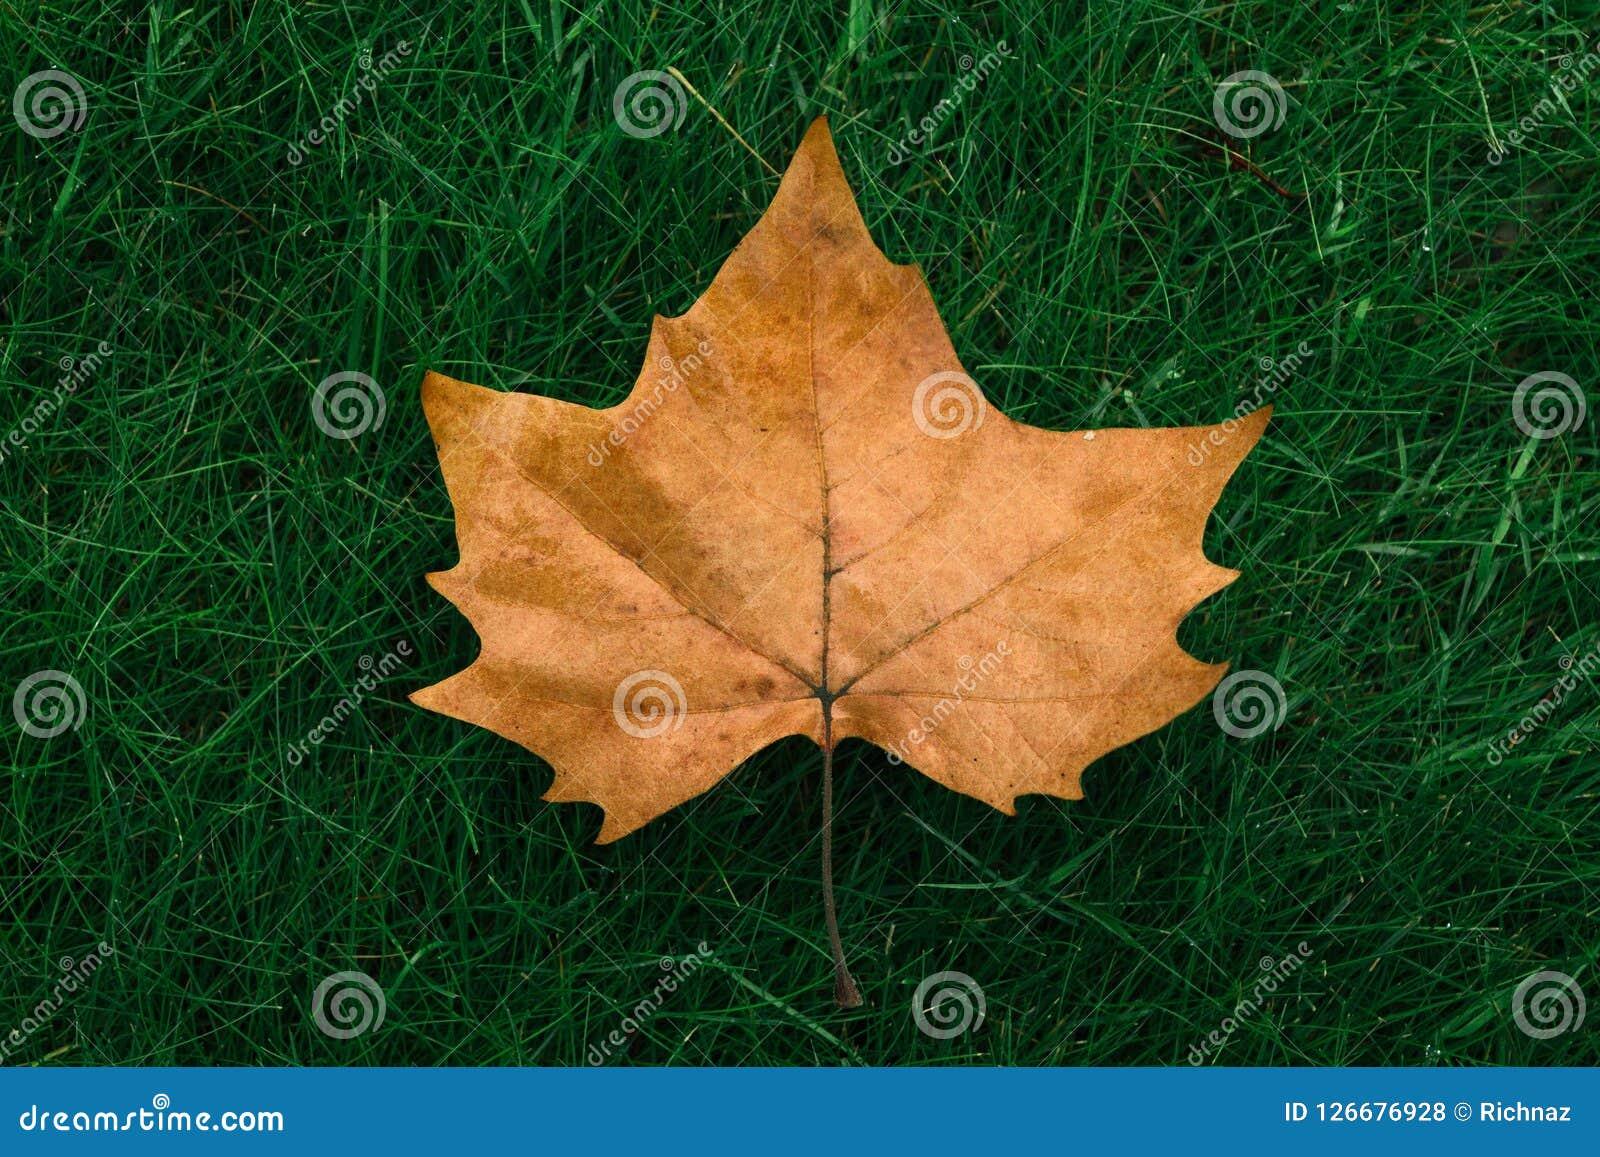 Autumn maple leaf on green grass